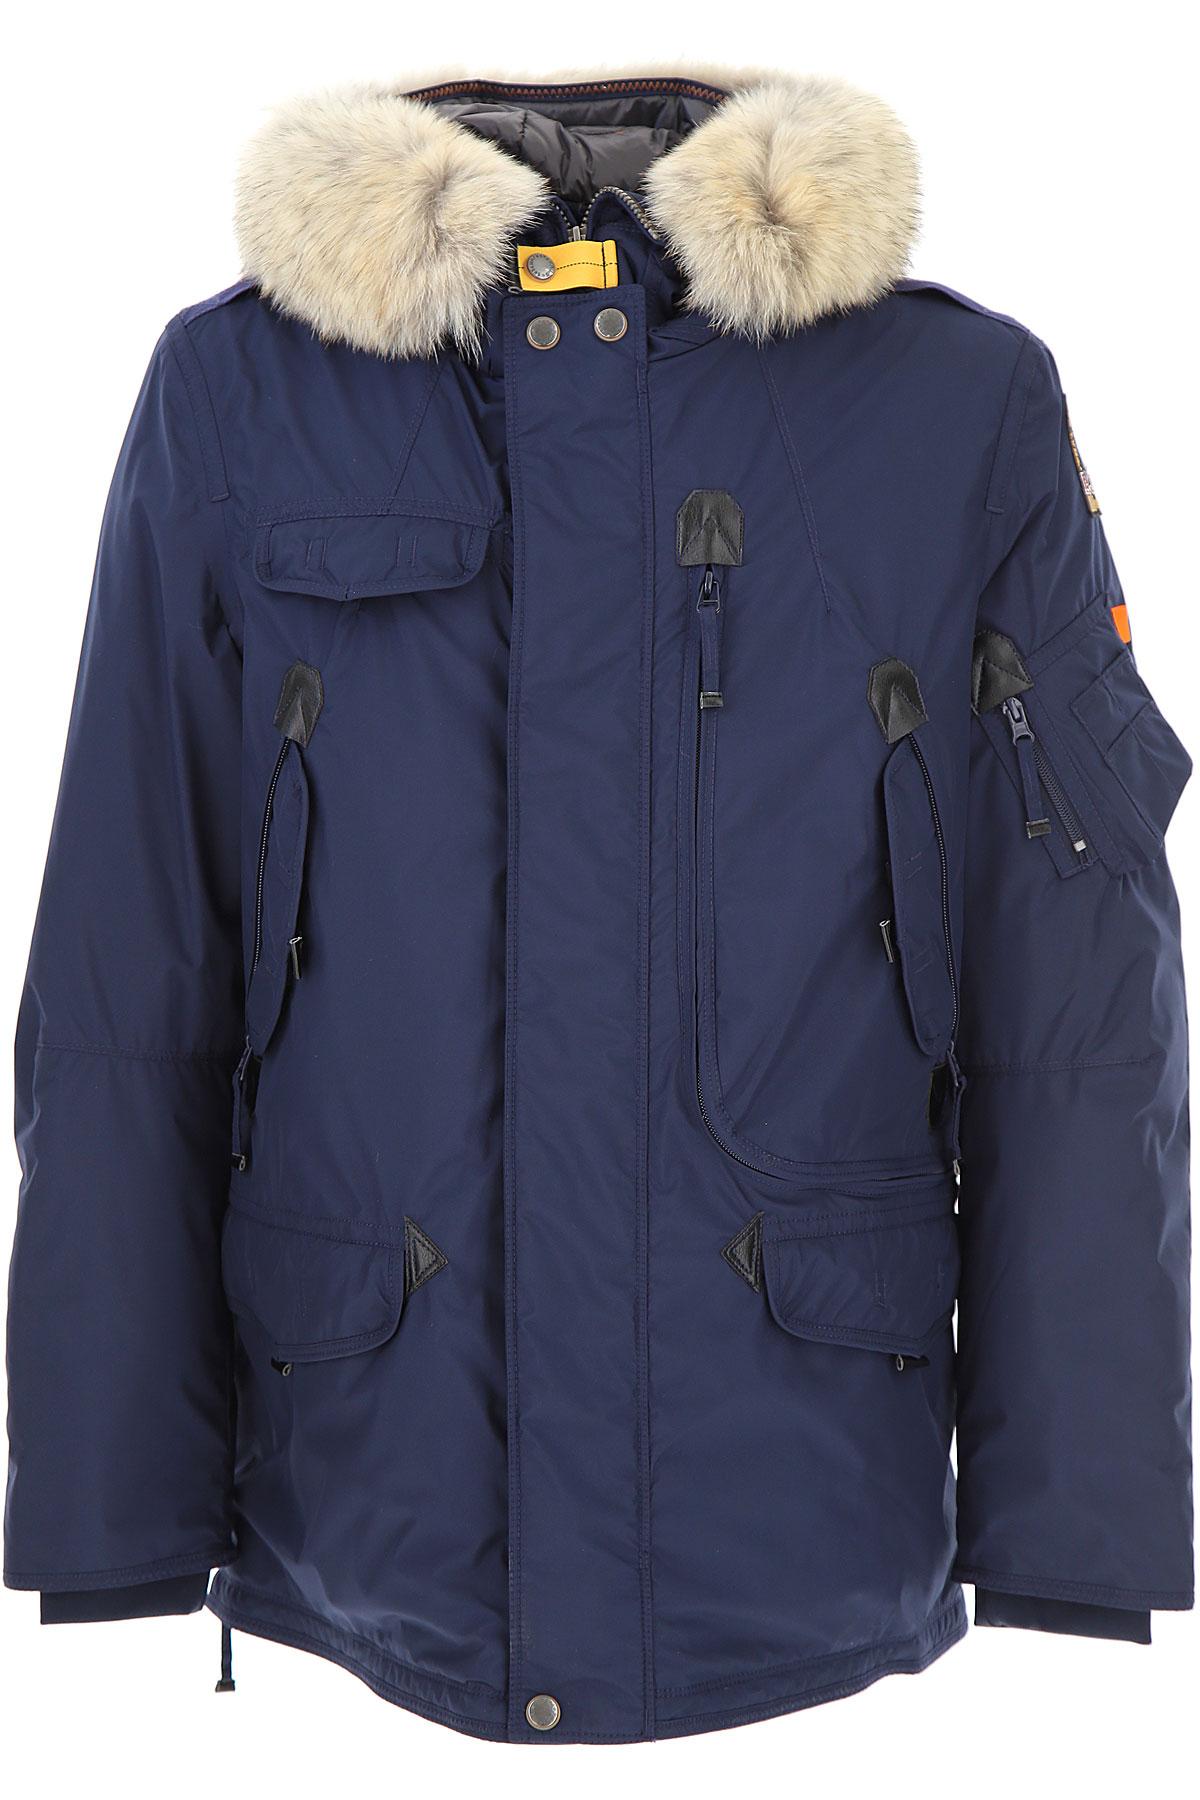 Image of Parajumpers Down Jacket for Men, Puffer Ski Jacket, navy, polyamide, 2017, L M XL